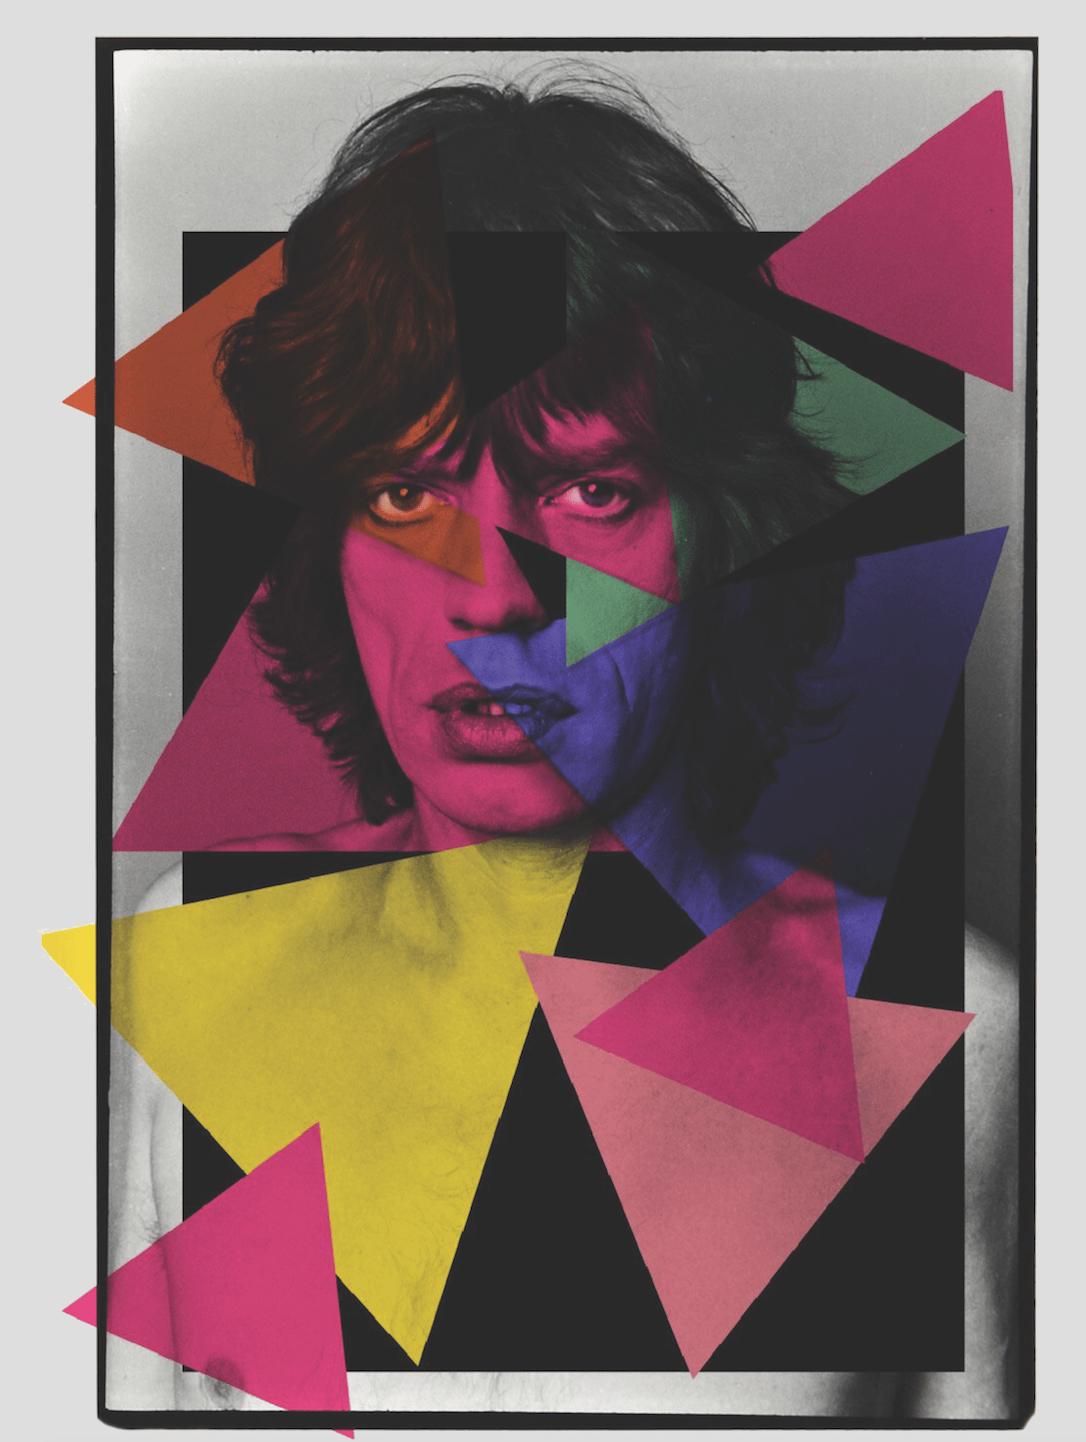 Image of Mr: Jagger